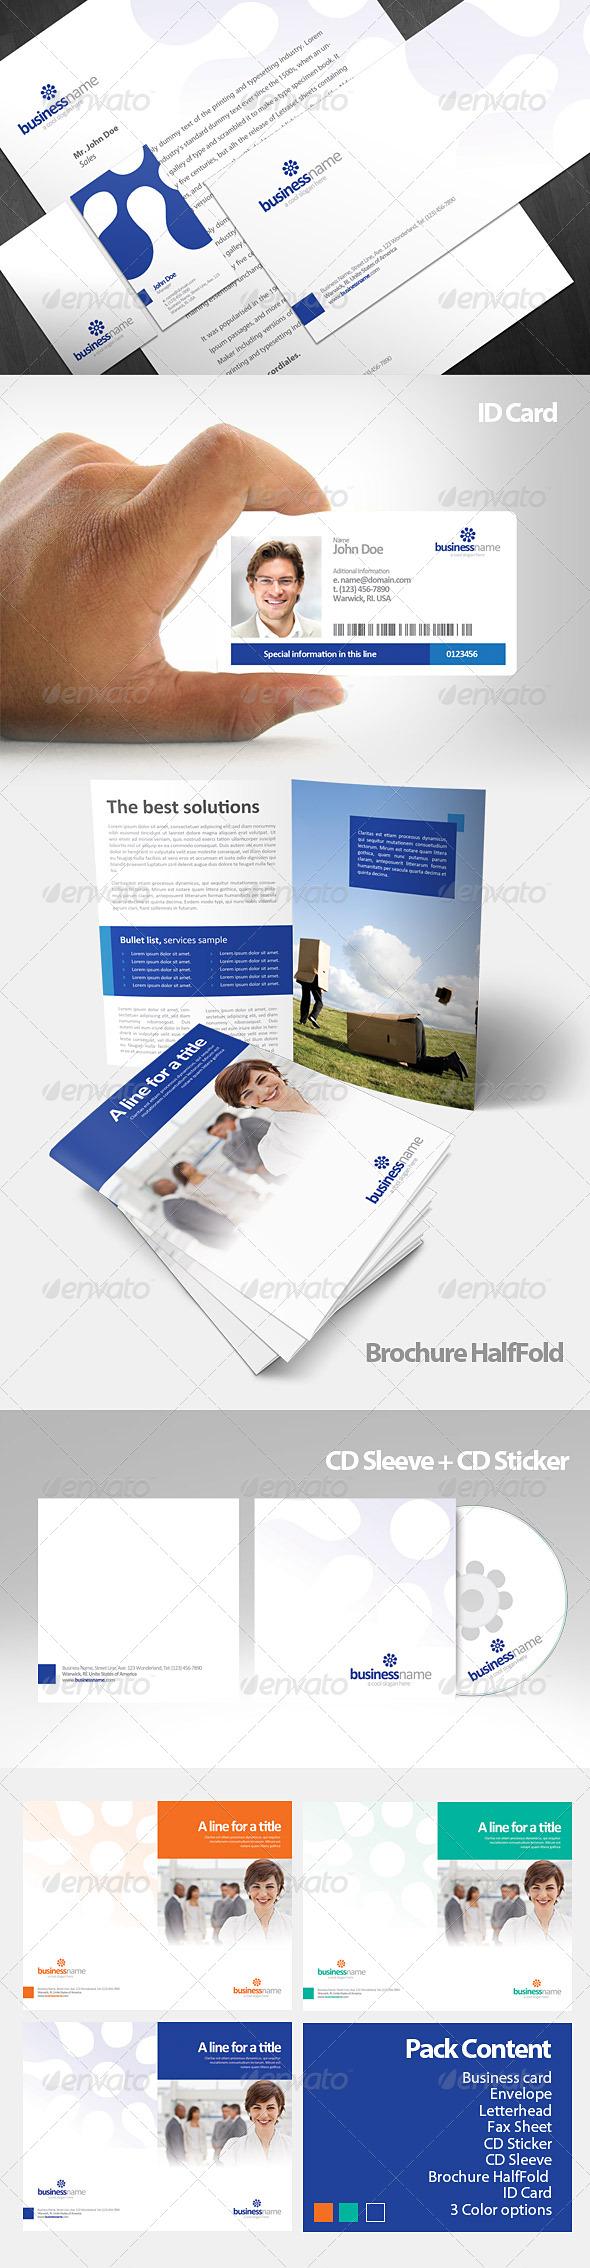 GraphicRiver Katra Corporate Identity Pack 159659